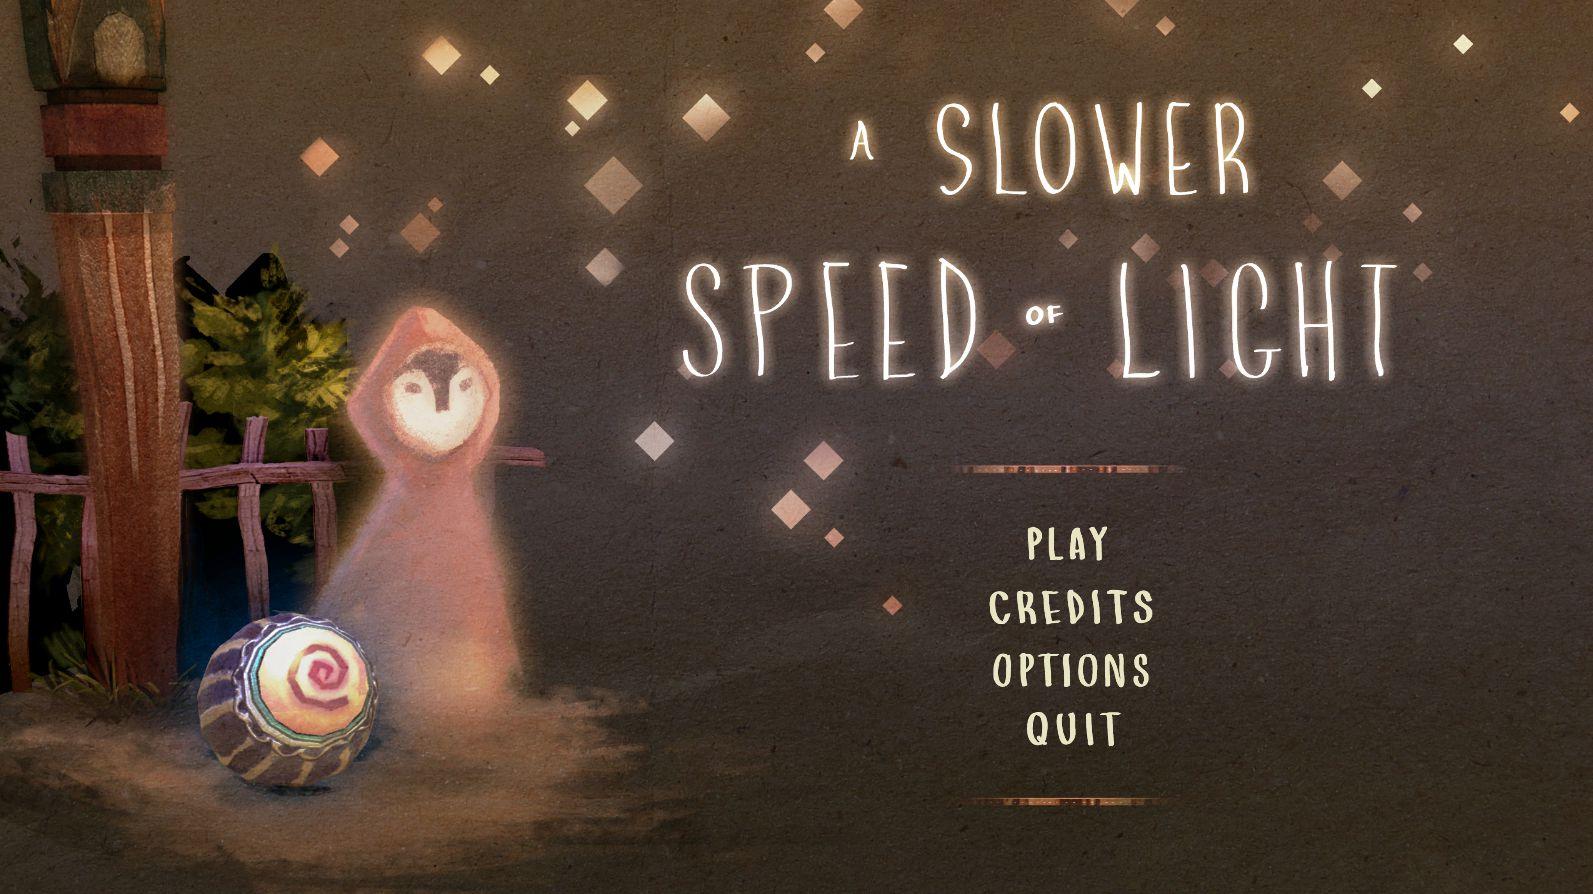 MIT開発の特殊相対性理論が学べるゲーム『A Slower Speed of Light』